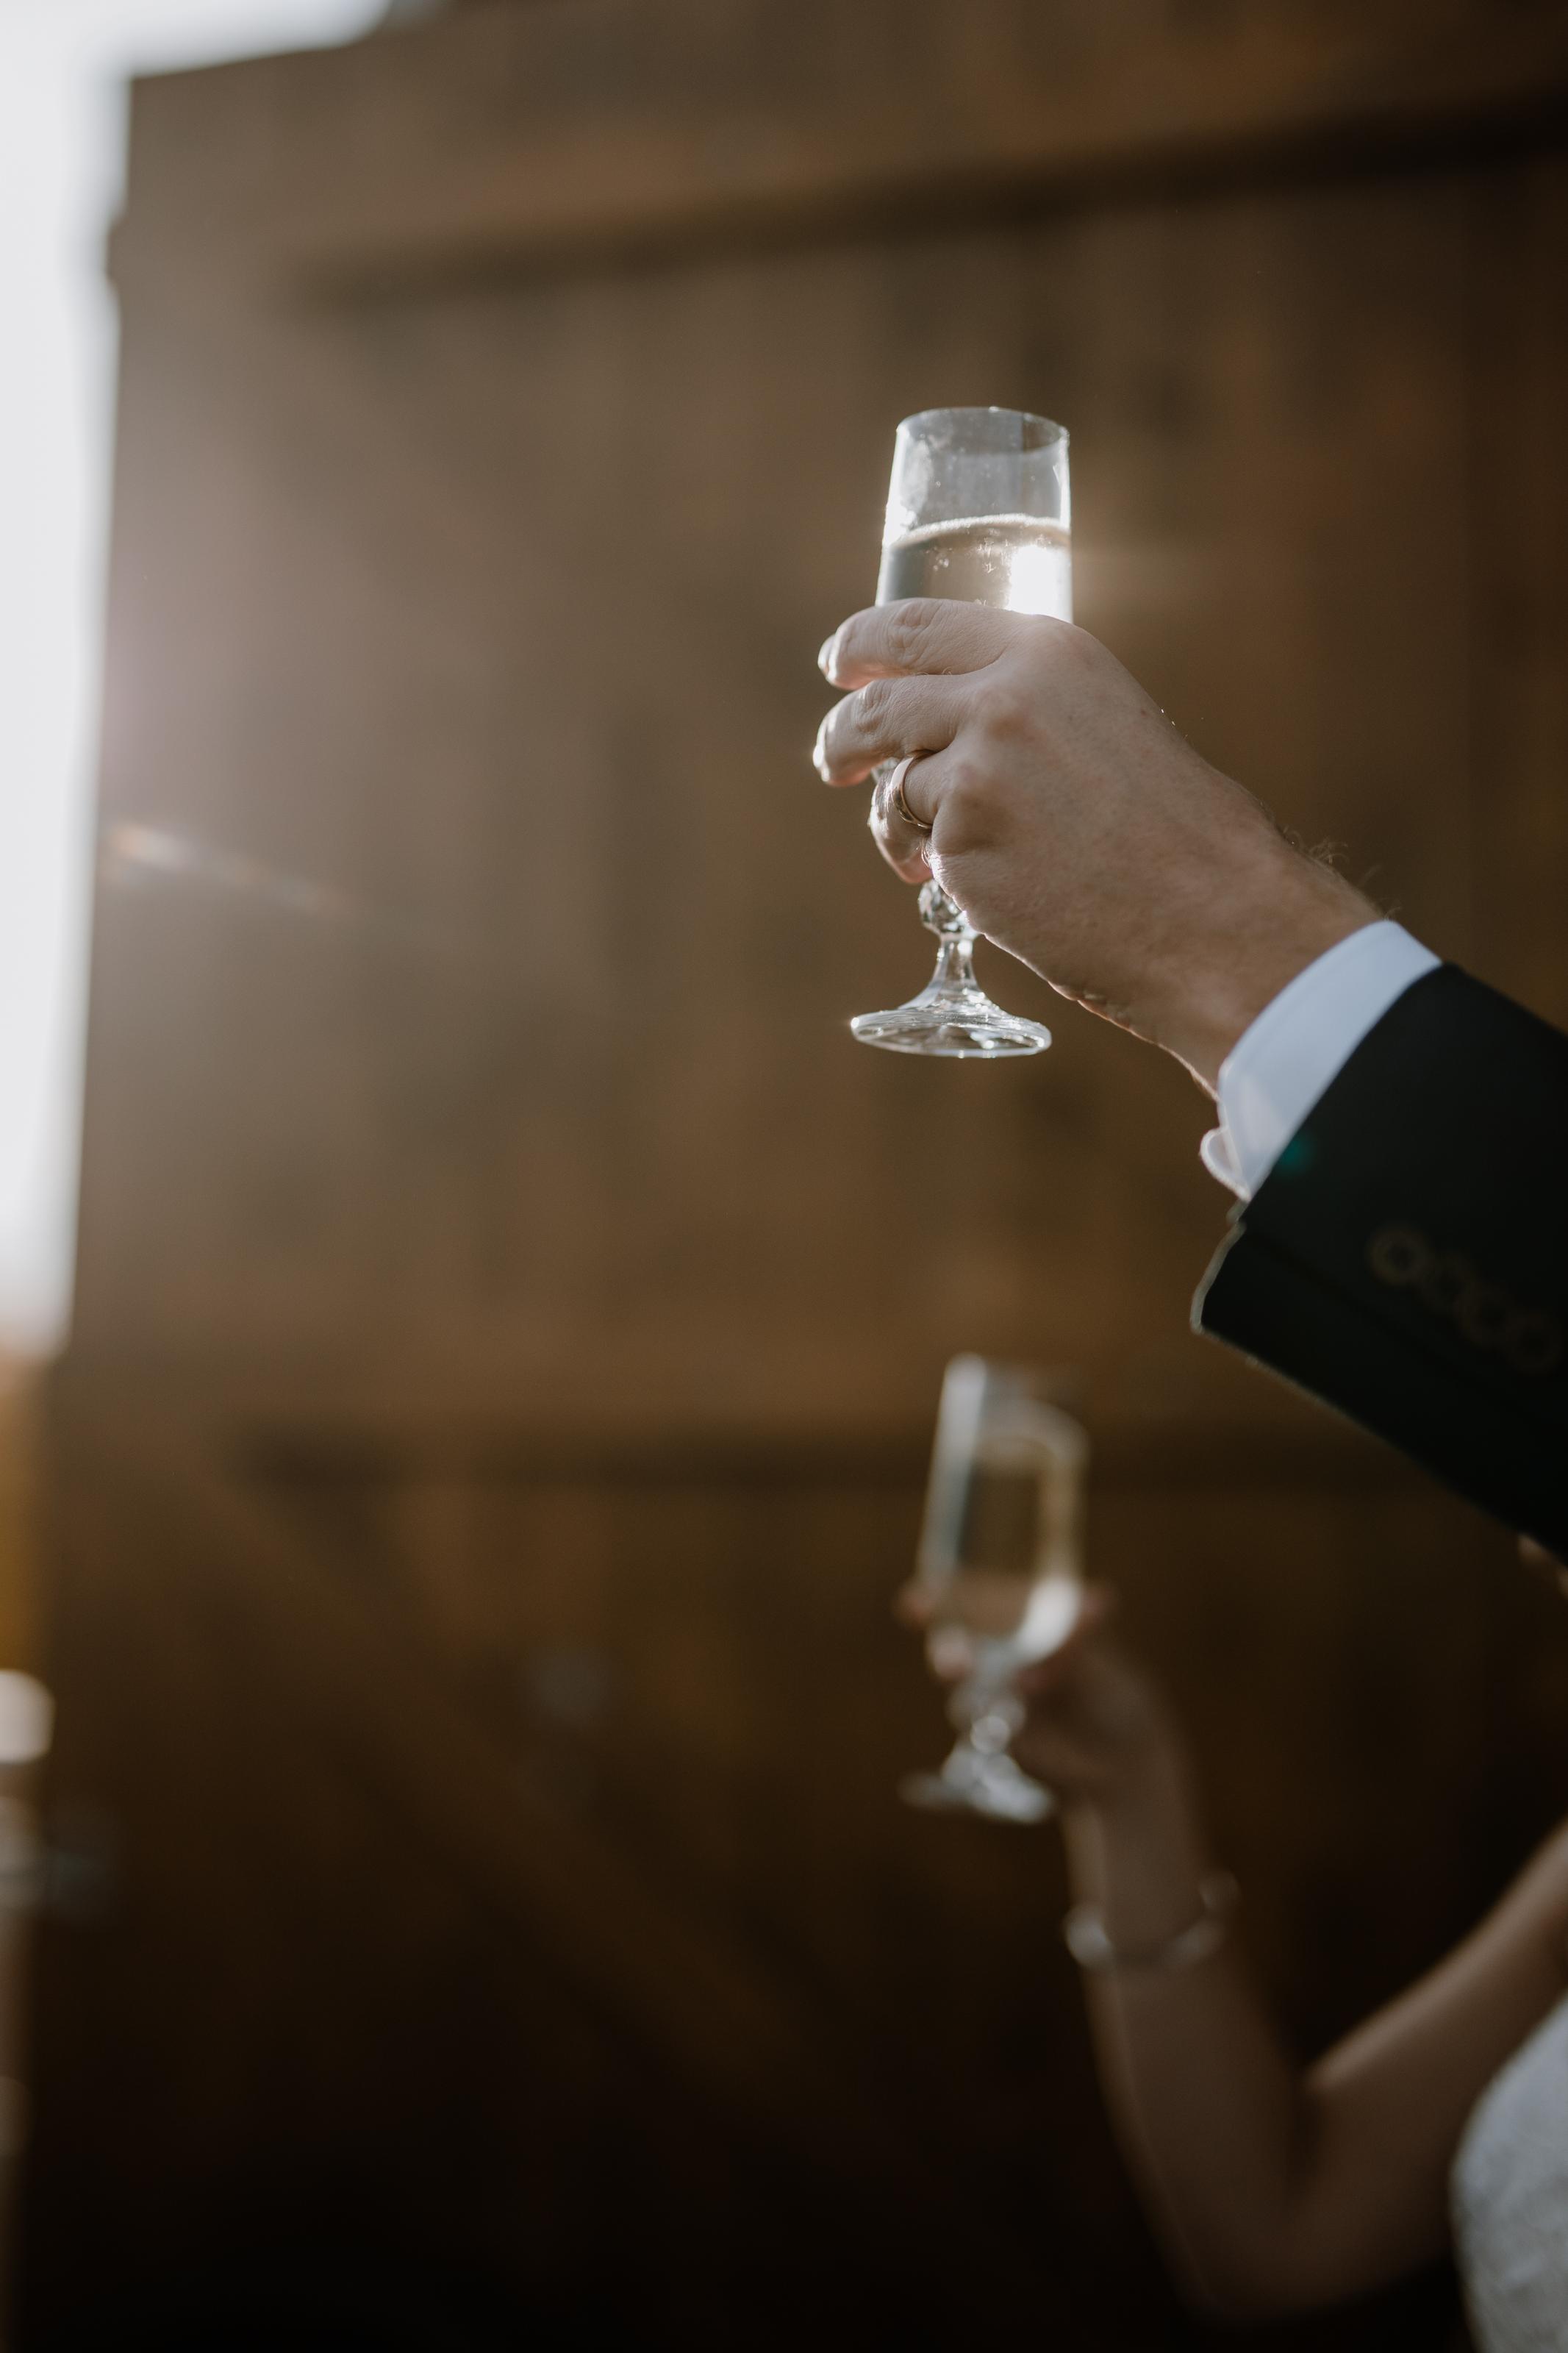 Bröllopsfotograf-Uddetorp Säteri-Höstbröllop-Fotograf Emilia- Bröllopsfotograf Borås-51.jpg